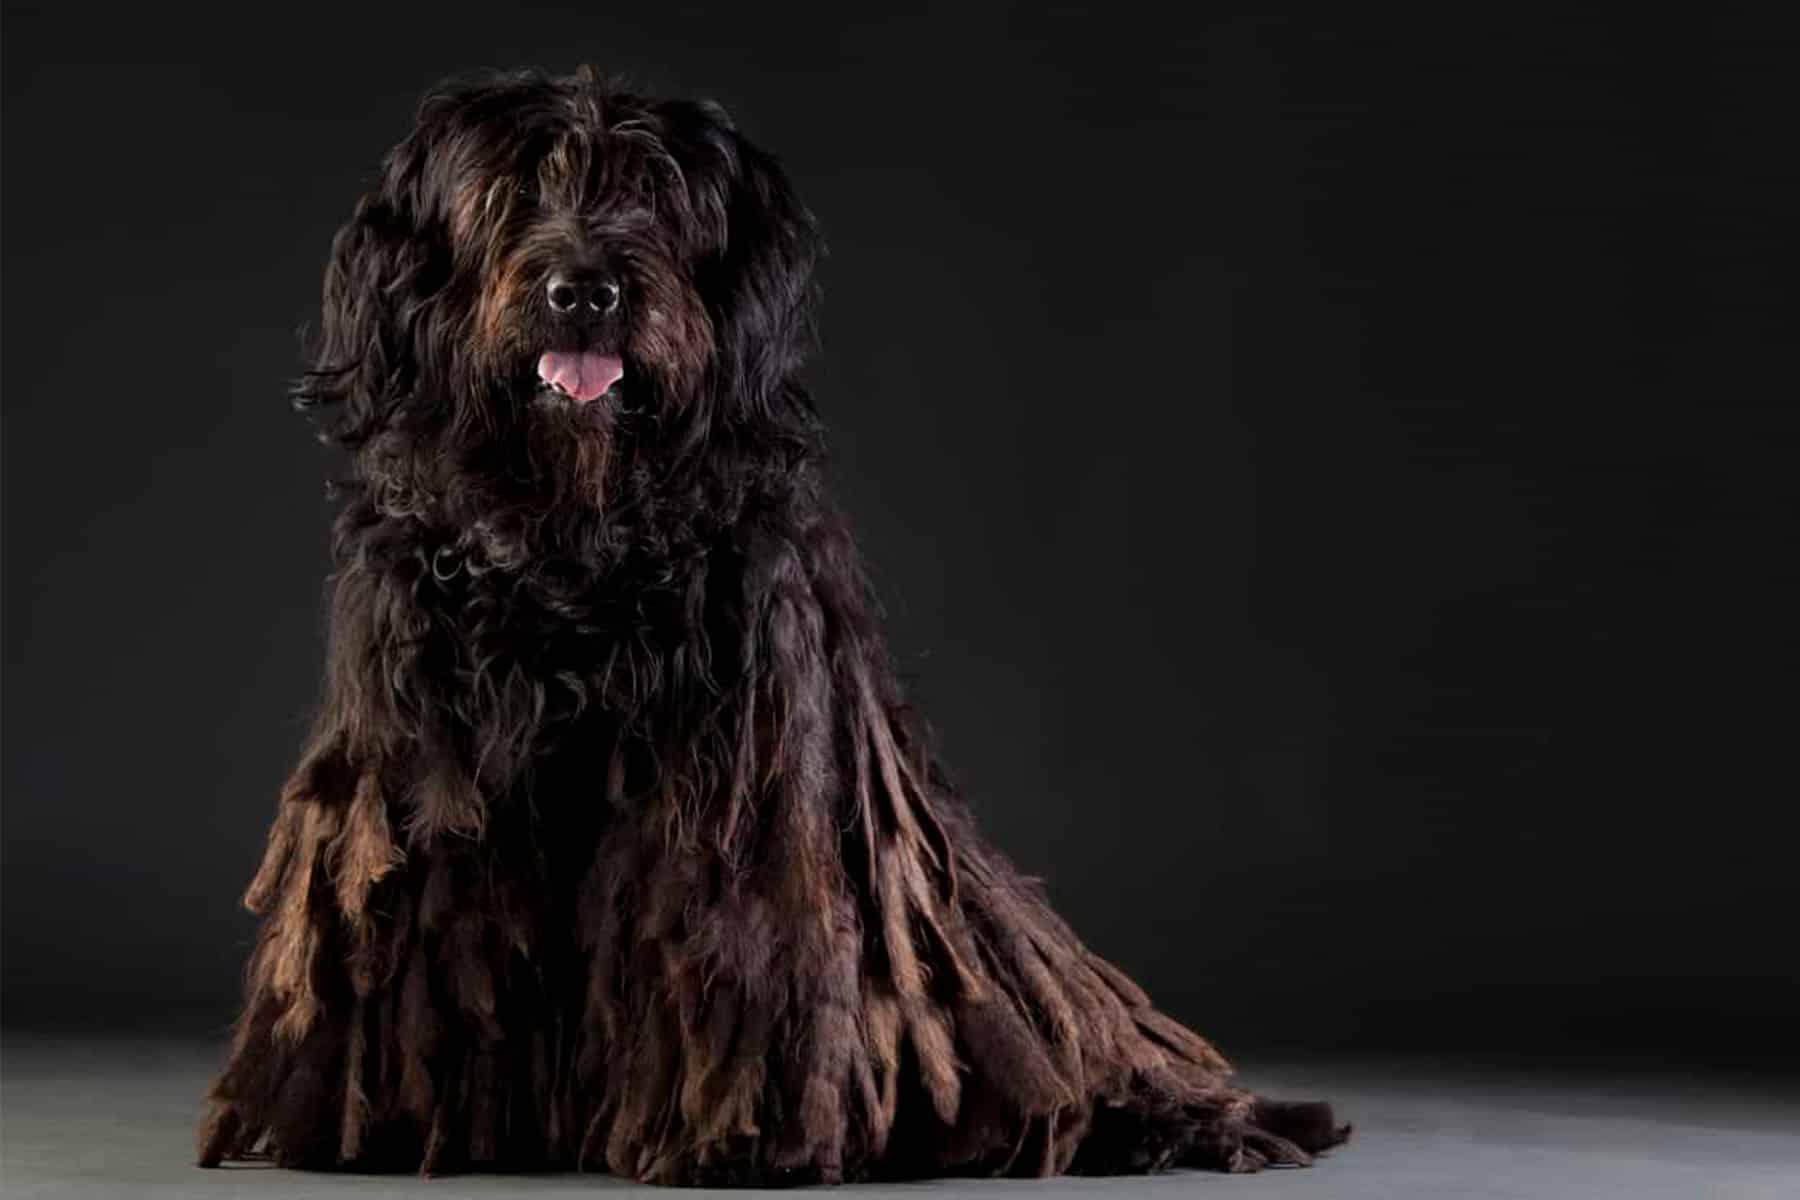 Bermasker Hirtenhund Portrait